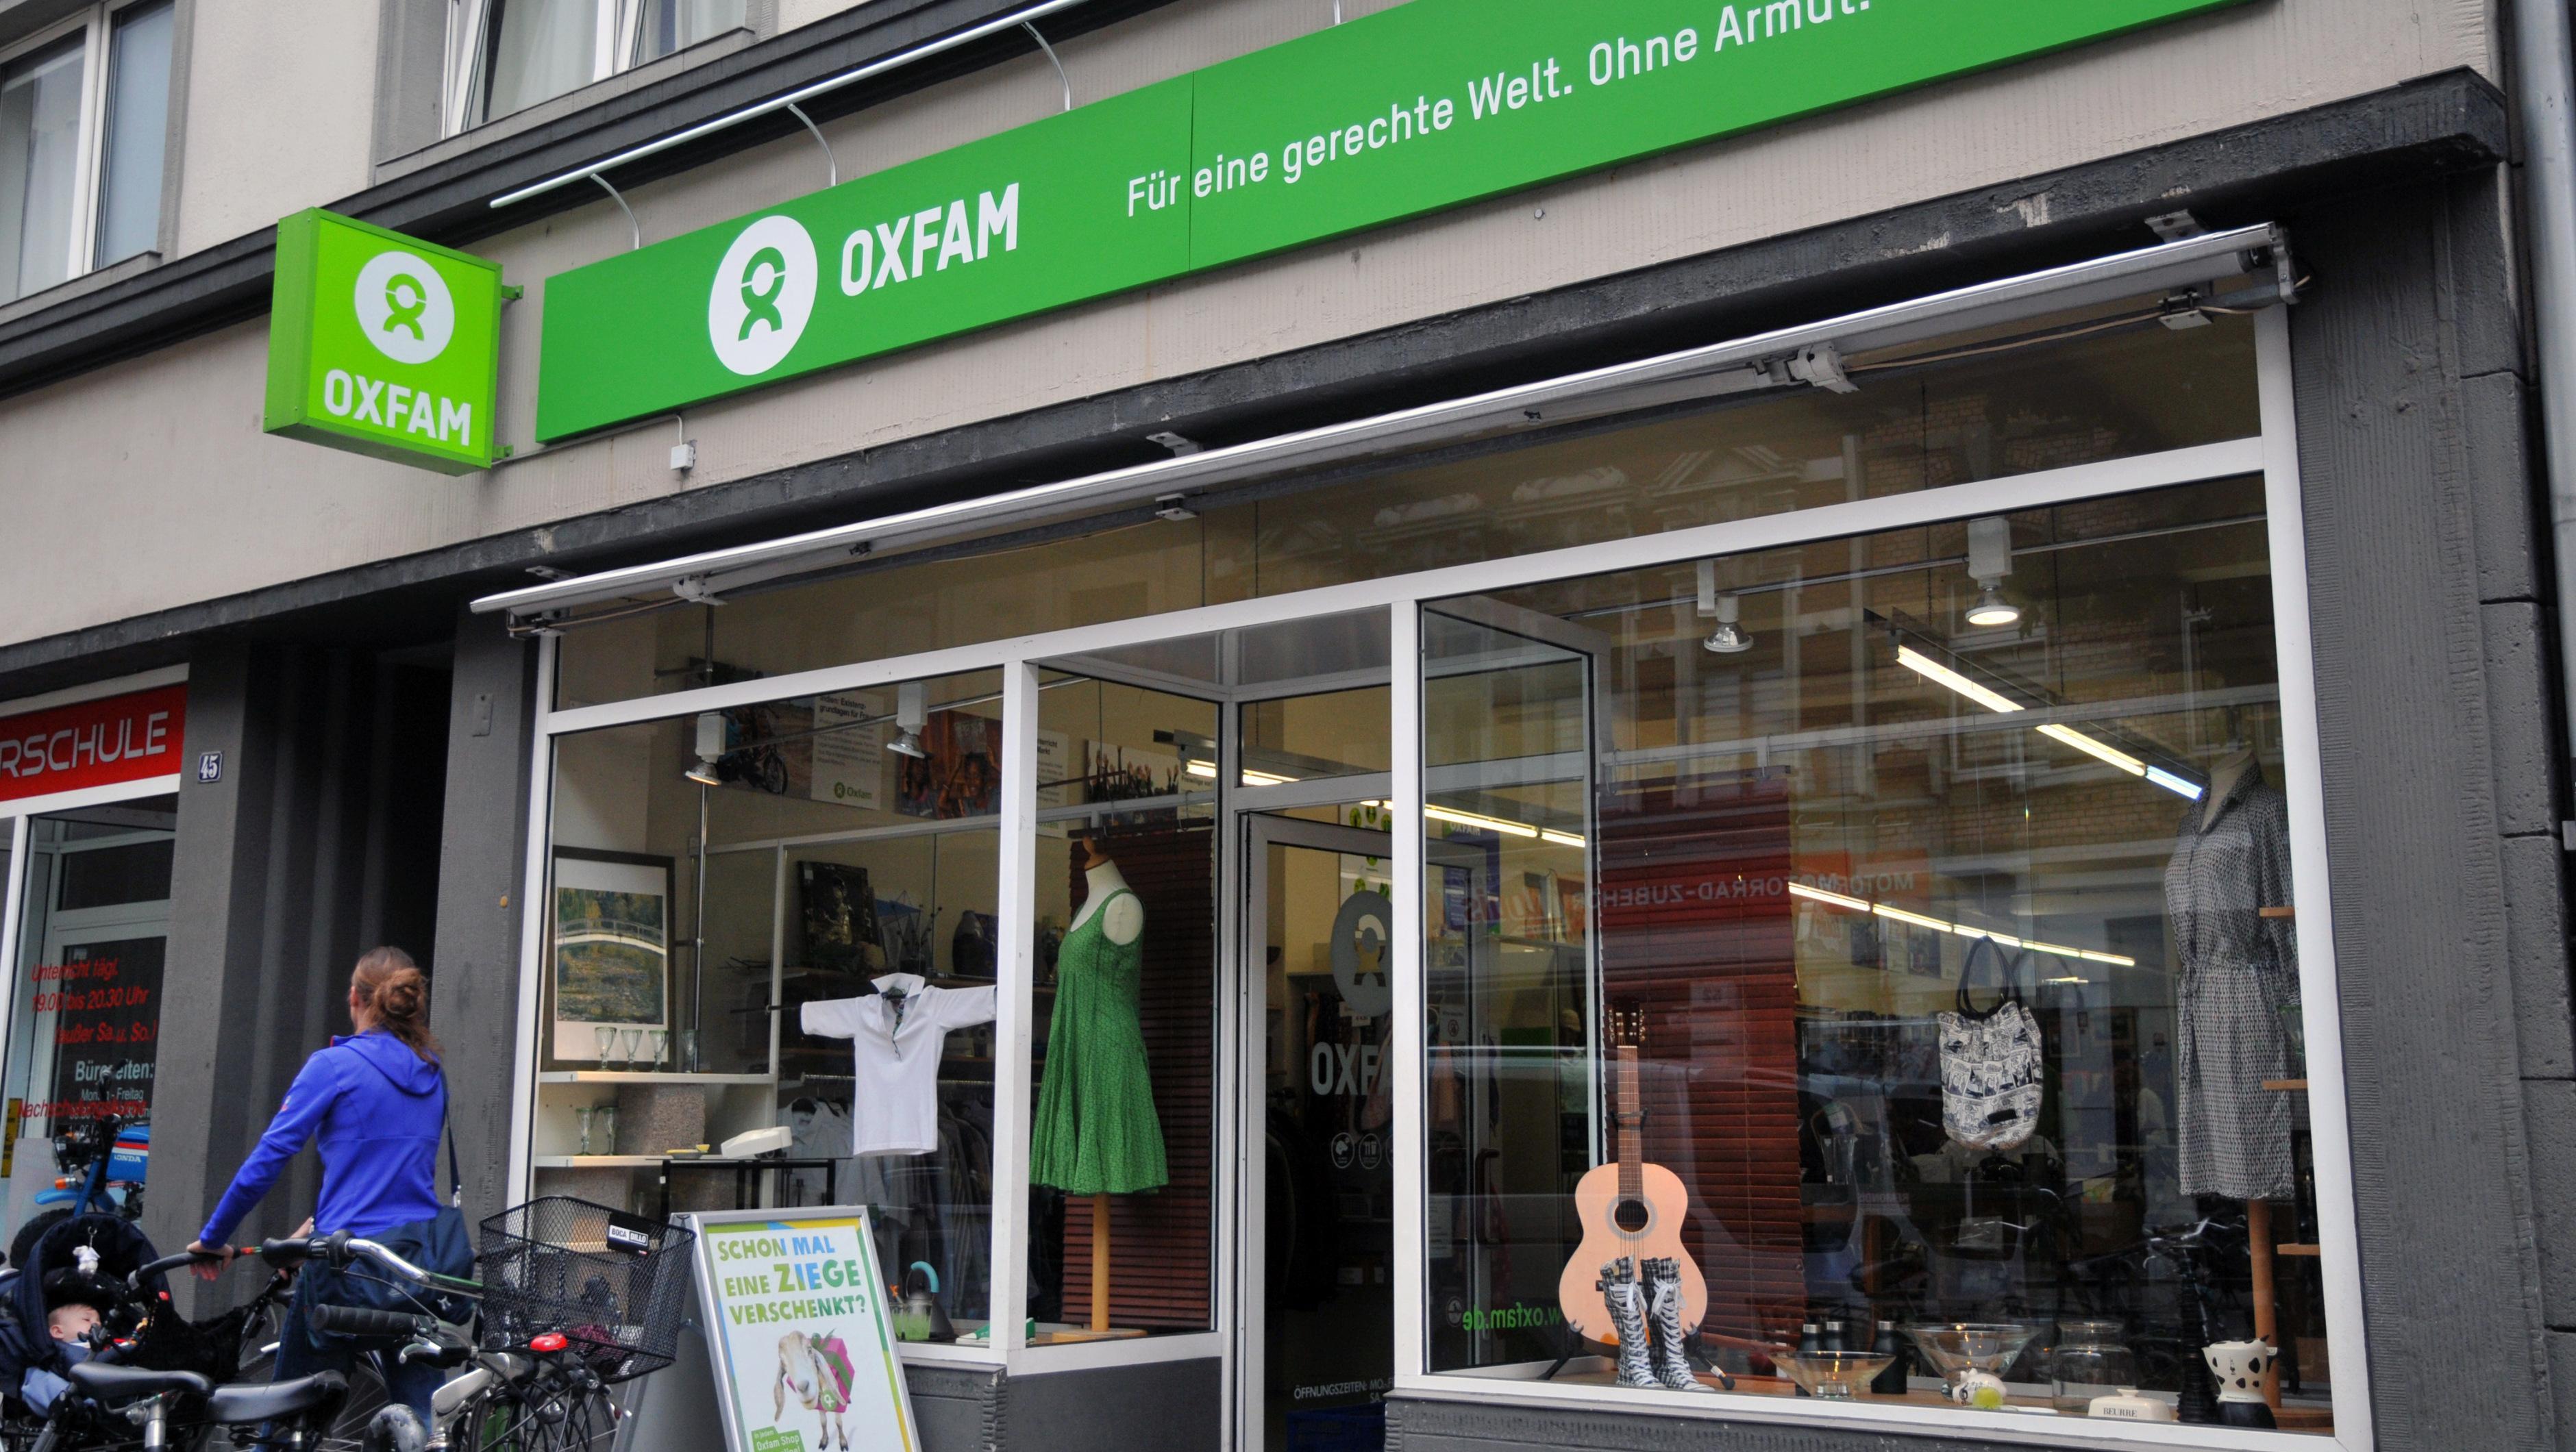 Oxfam Shop Köln-Südstadt - Außenansicht